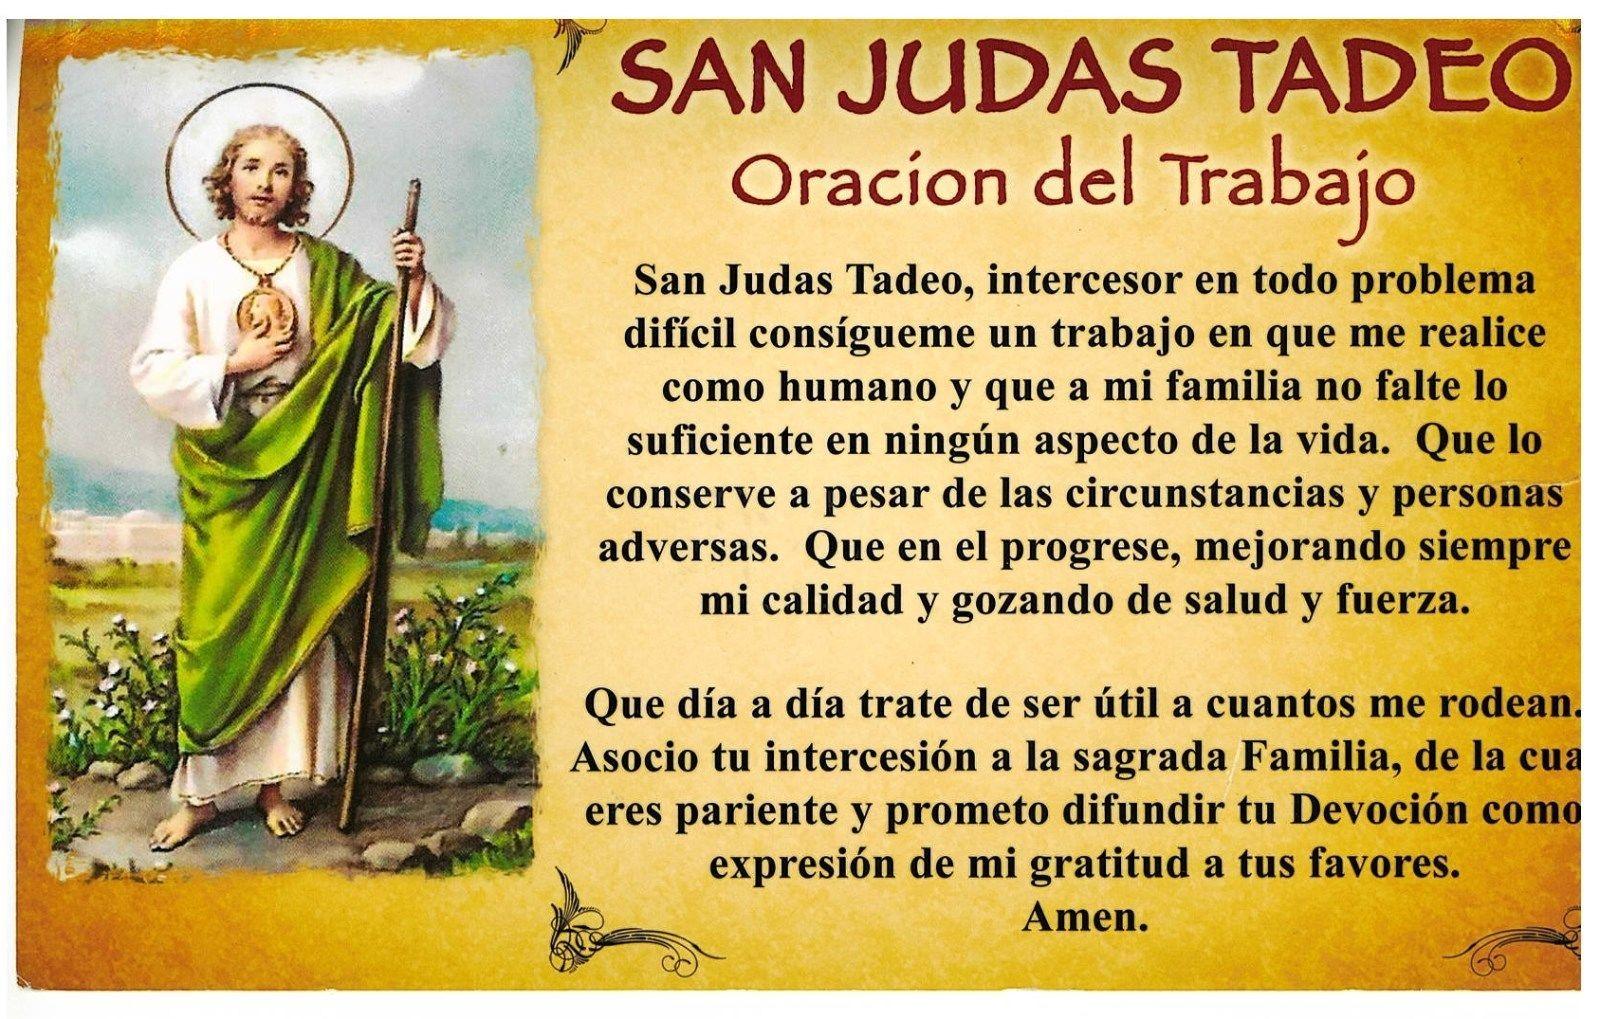 SAN JUDAS TADEO - Oracion del Tadajo - 01170